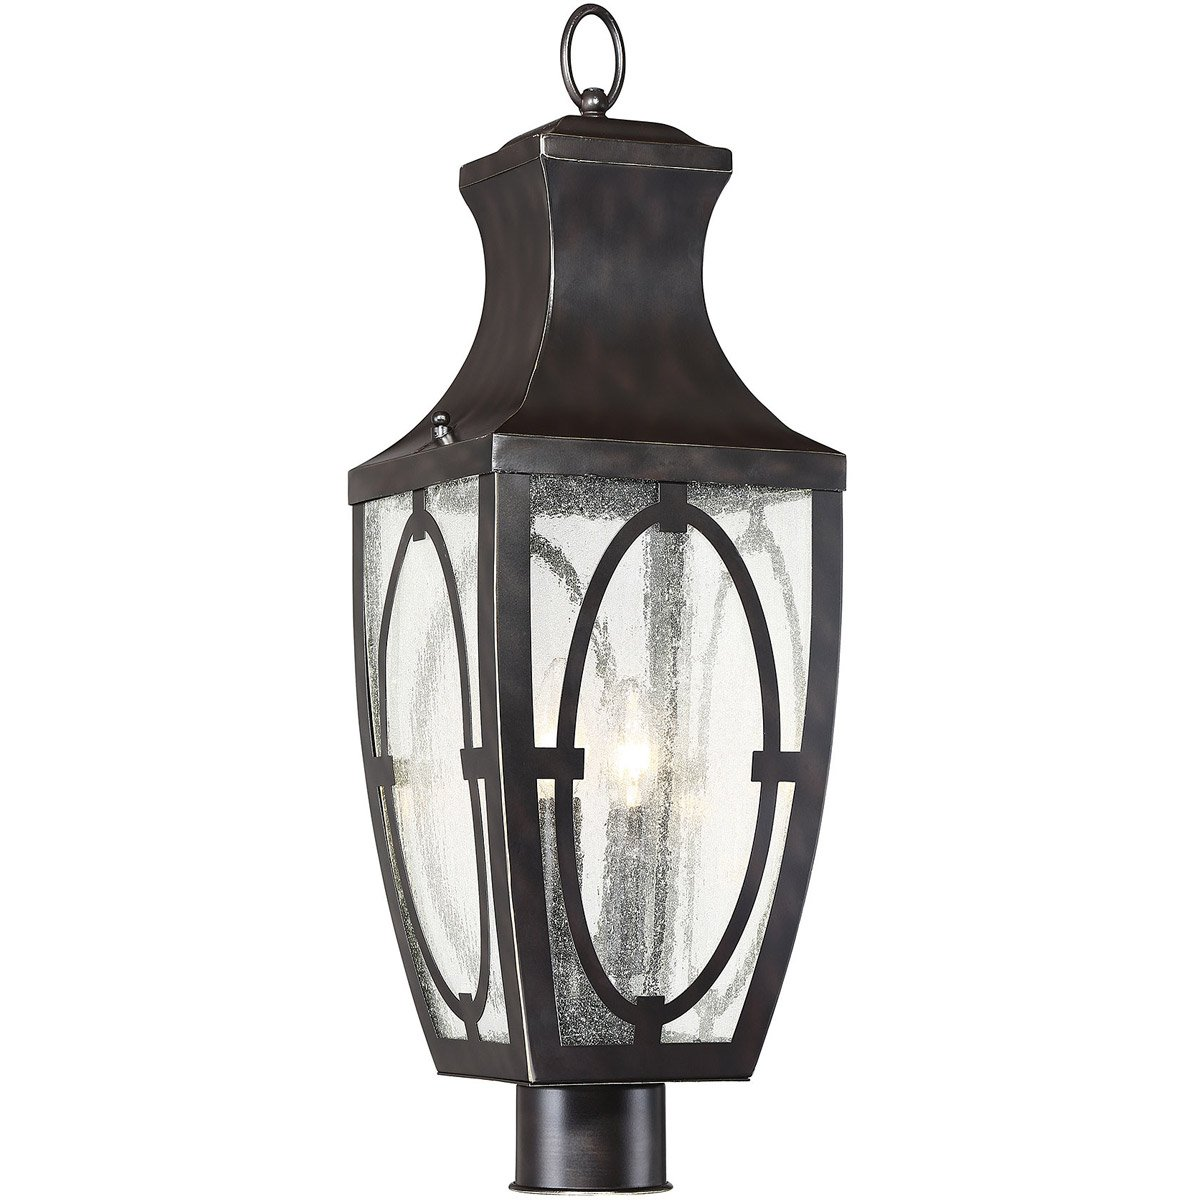 Savoy House 5-264-213 Shelton 2-Light Outdoor Post Lantern in English Bronze/Gold